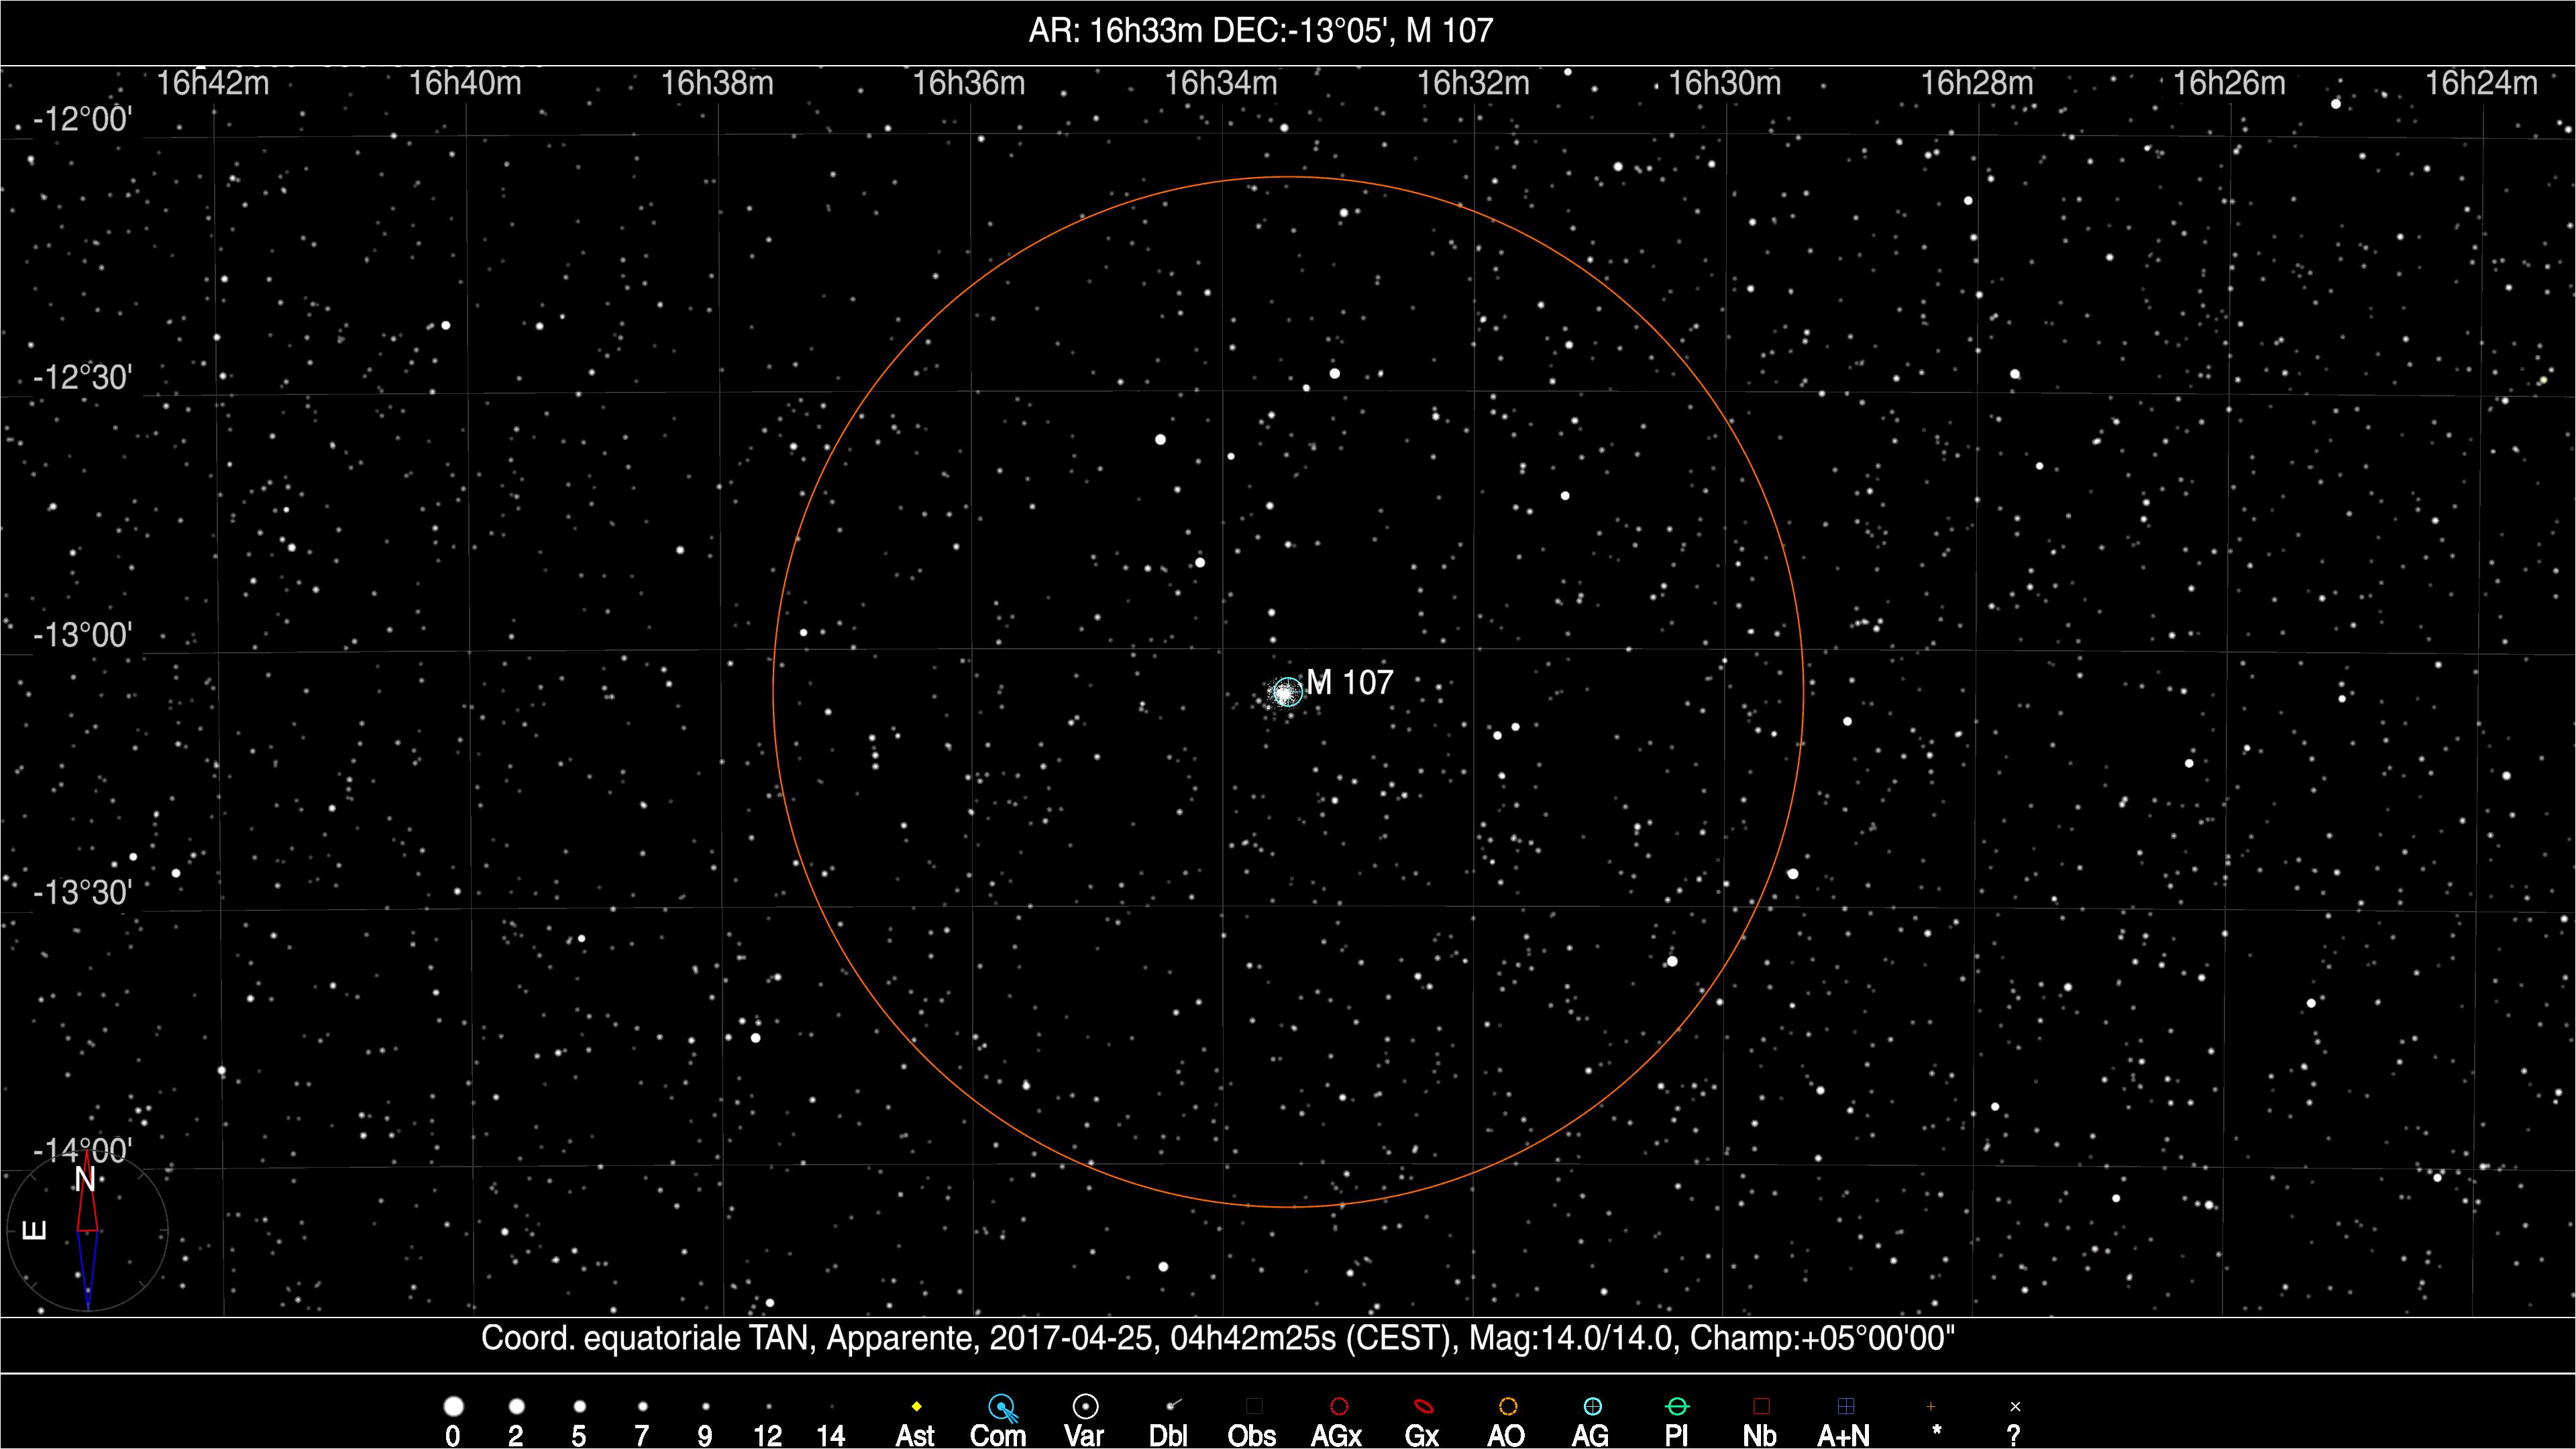 M107_5